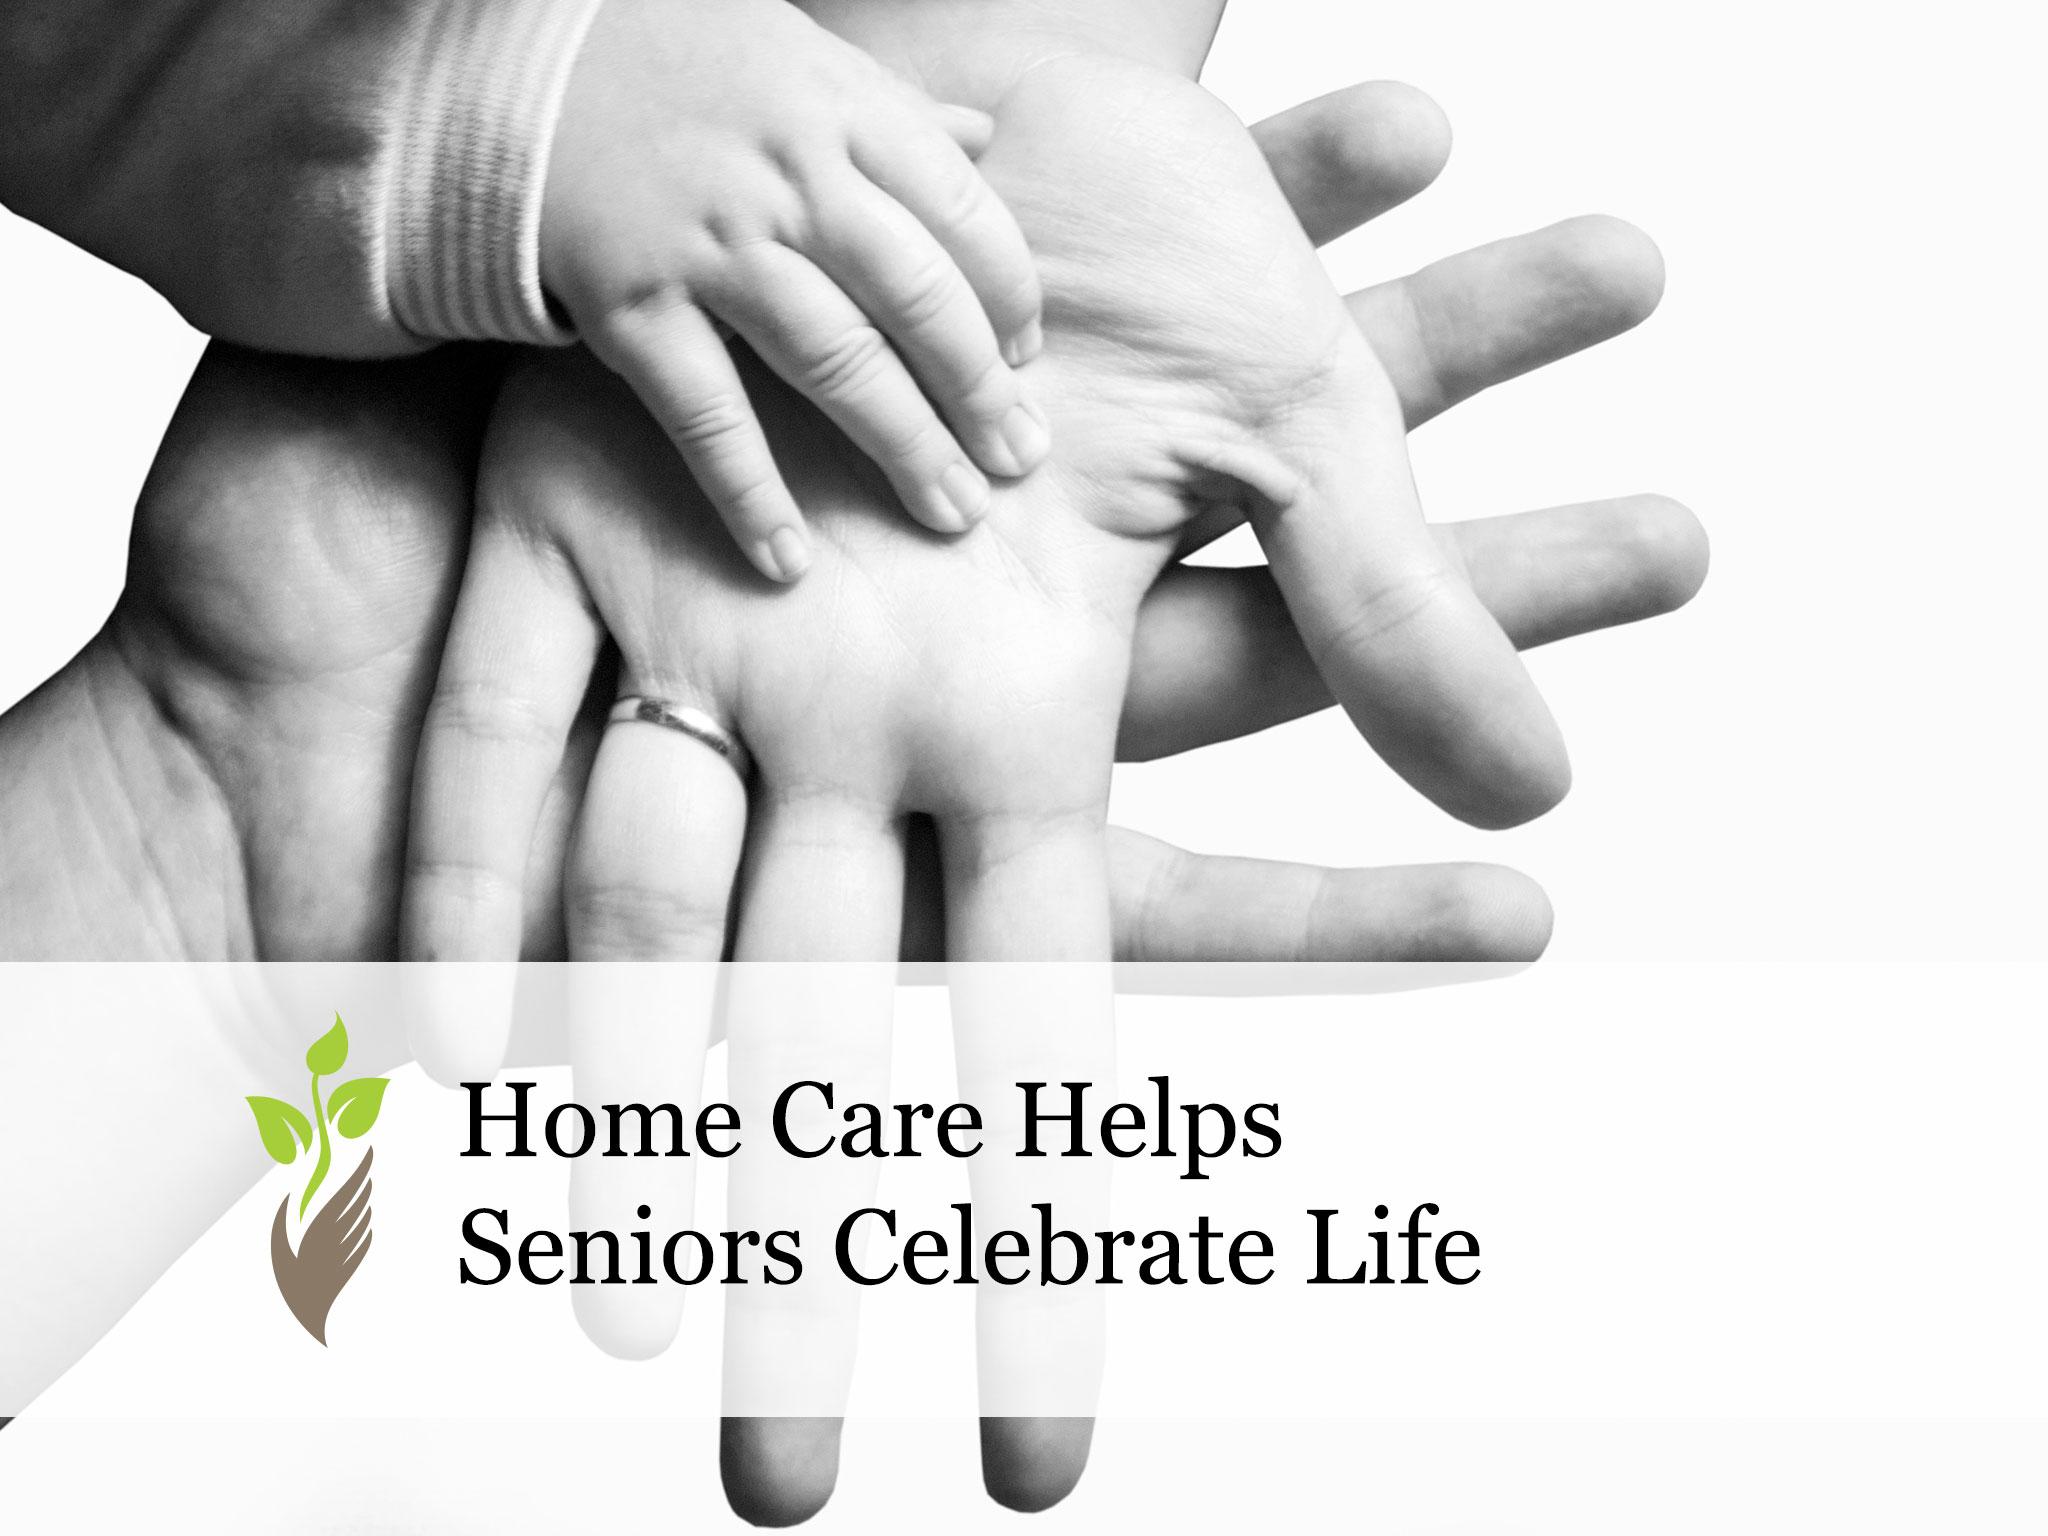 Home Care Helps Seniors Celebrate Life